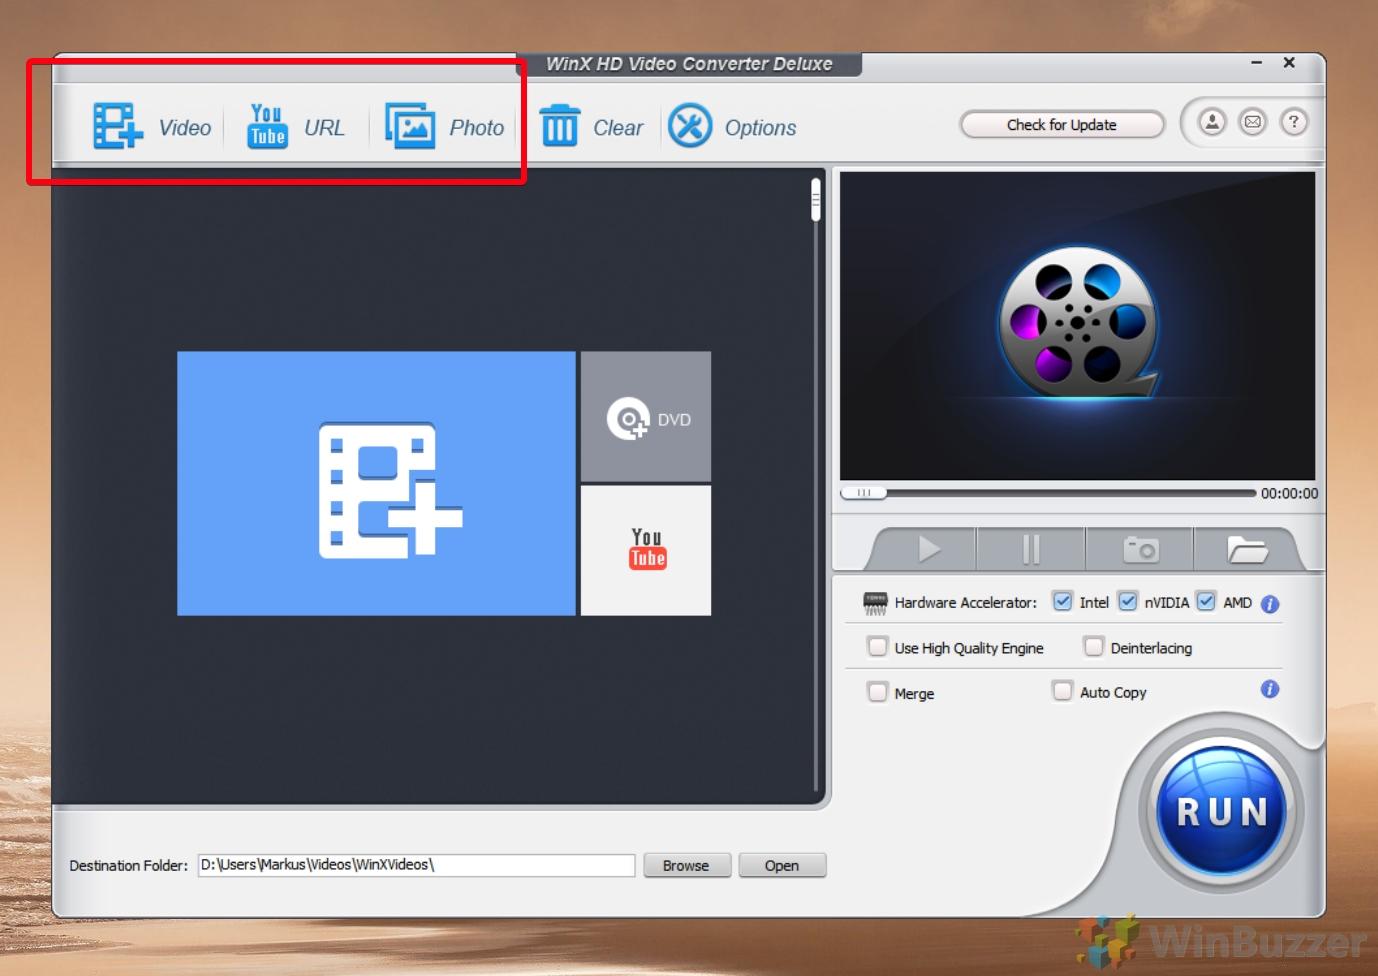 WinX Video Converter - Select Source